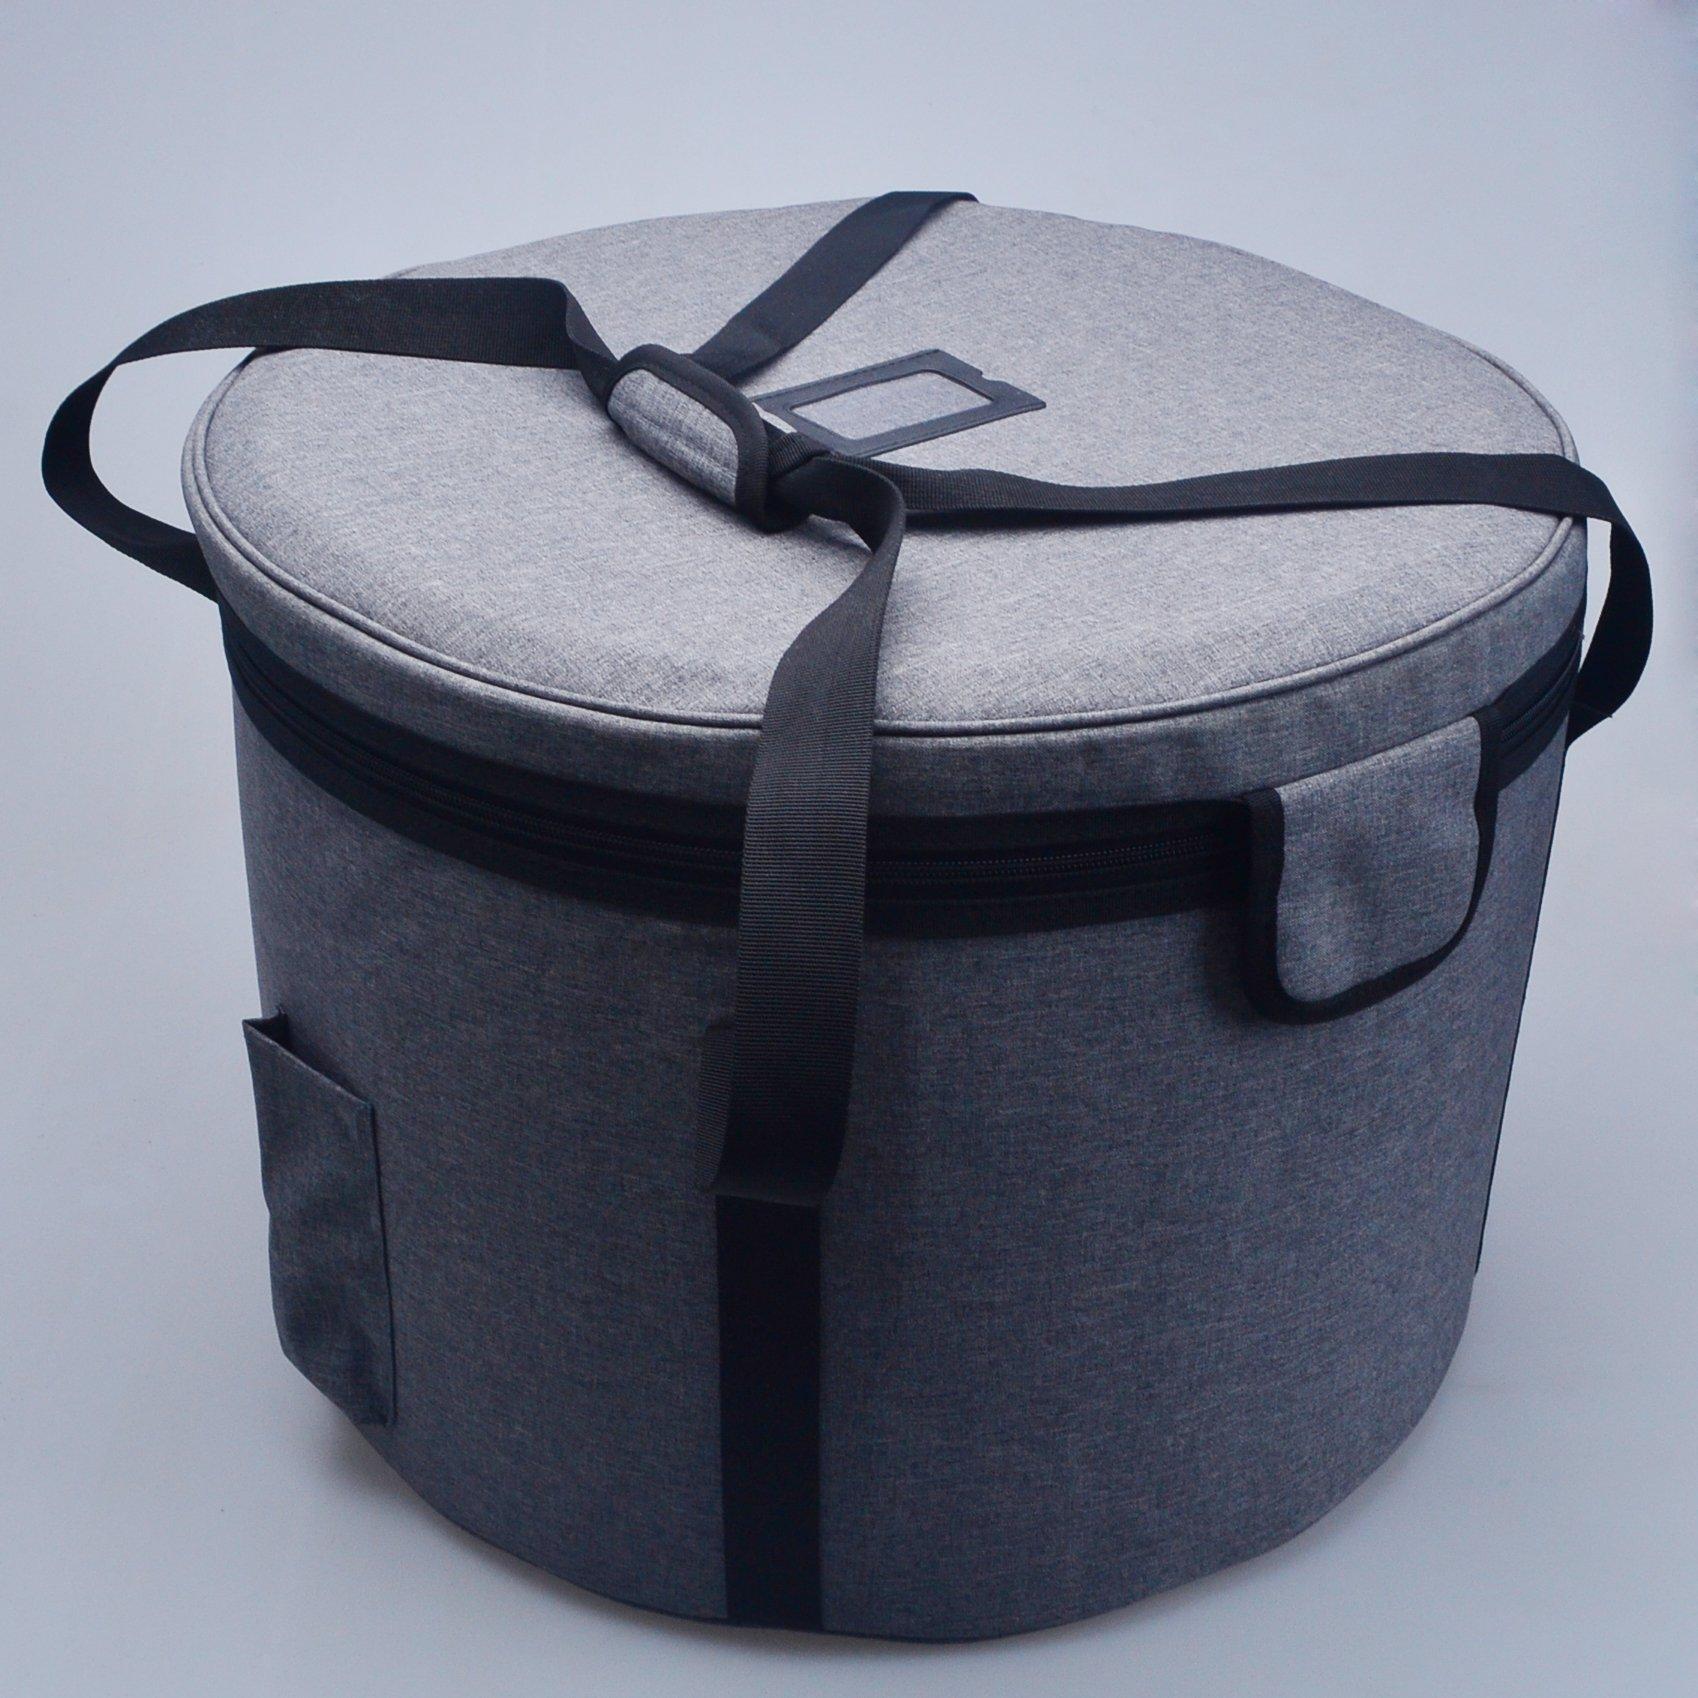 Crystal Singing Bowl Carry Case Travelling Bag For Size 10''